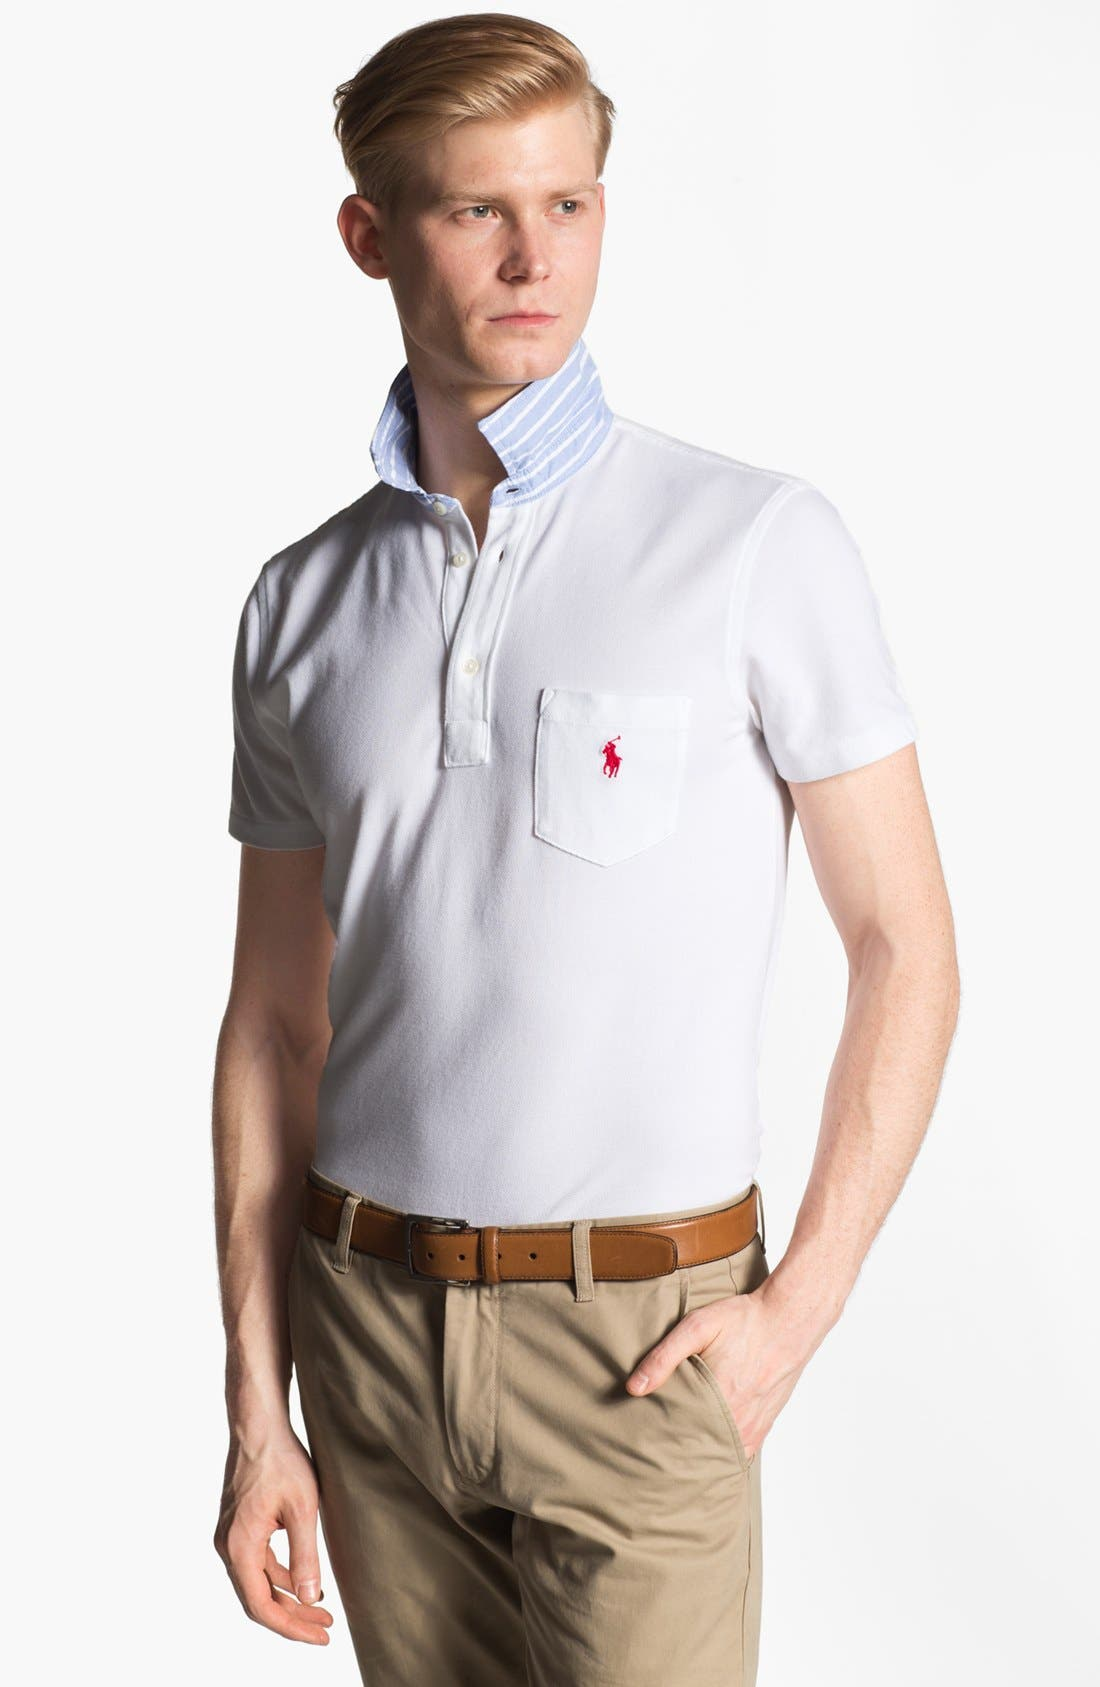 Alternate Image 1 Selected - Polo Ralph Lauren Cotton Polo